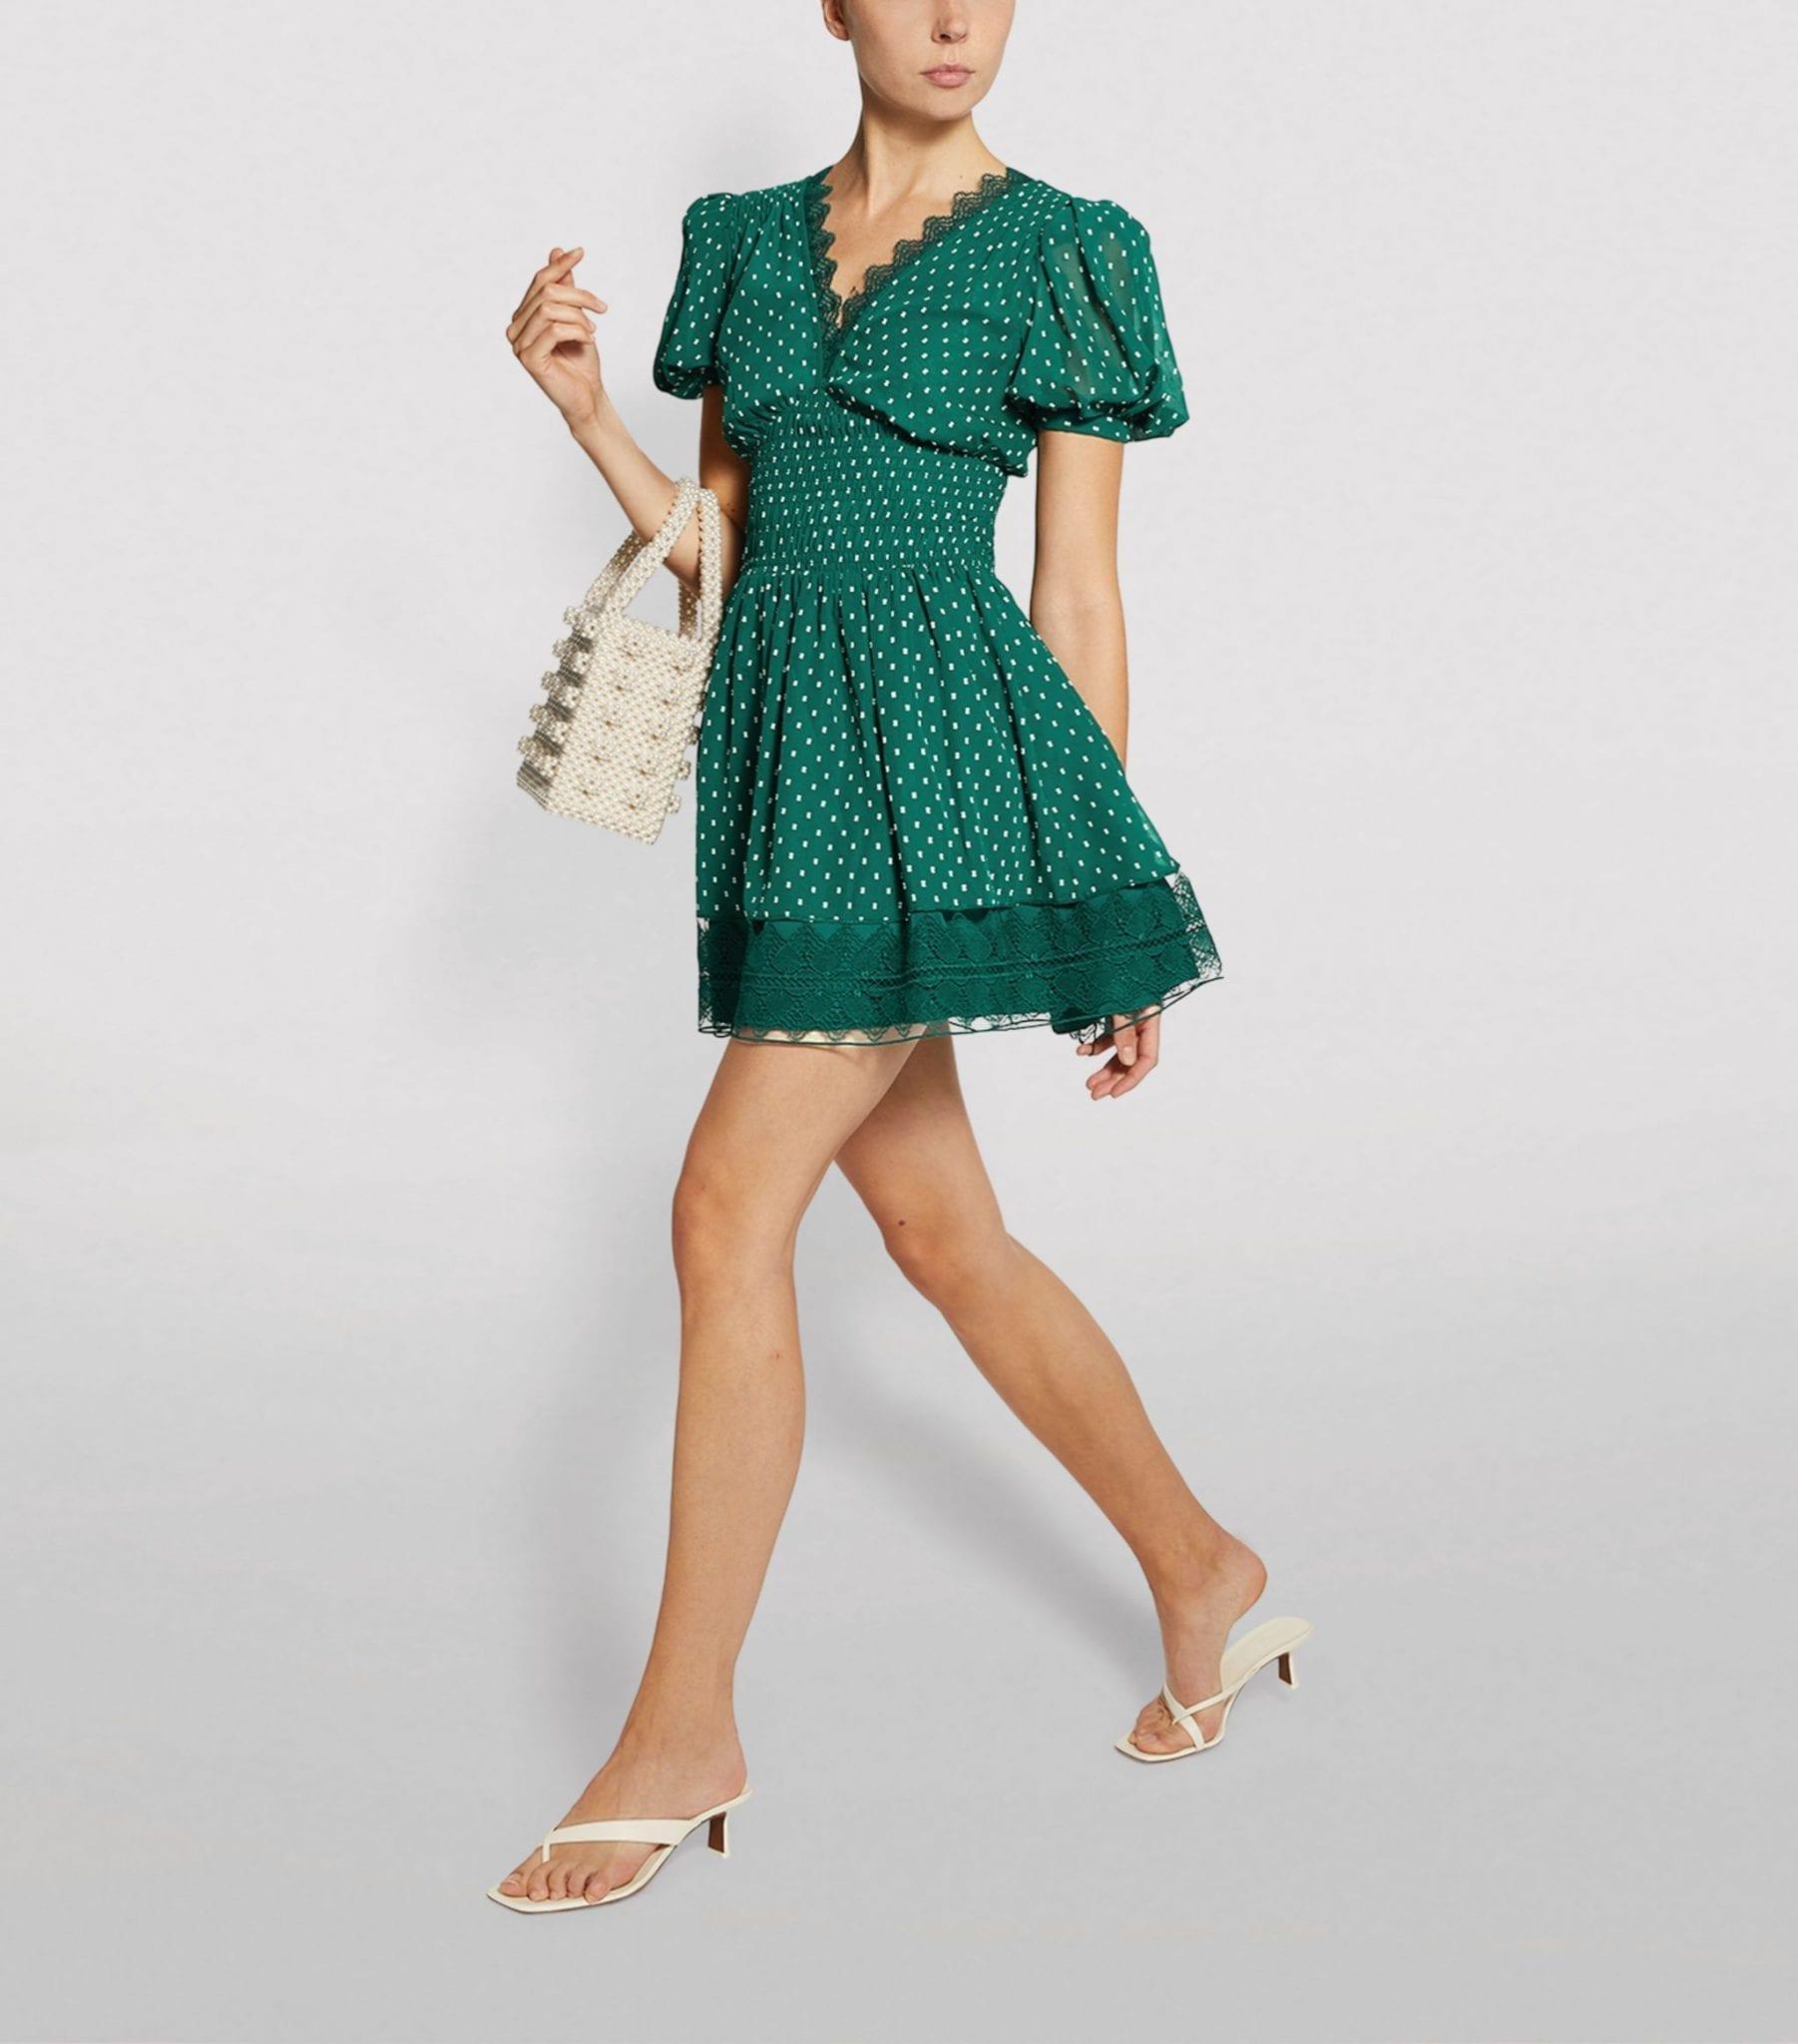 SELF-PORTRAIT Polka-Dot Puff-Sleeved Mini Dress